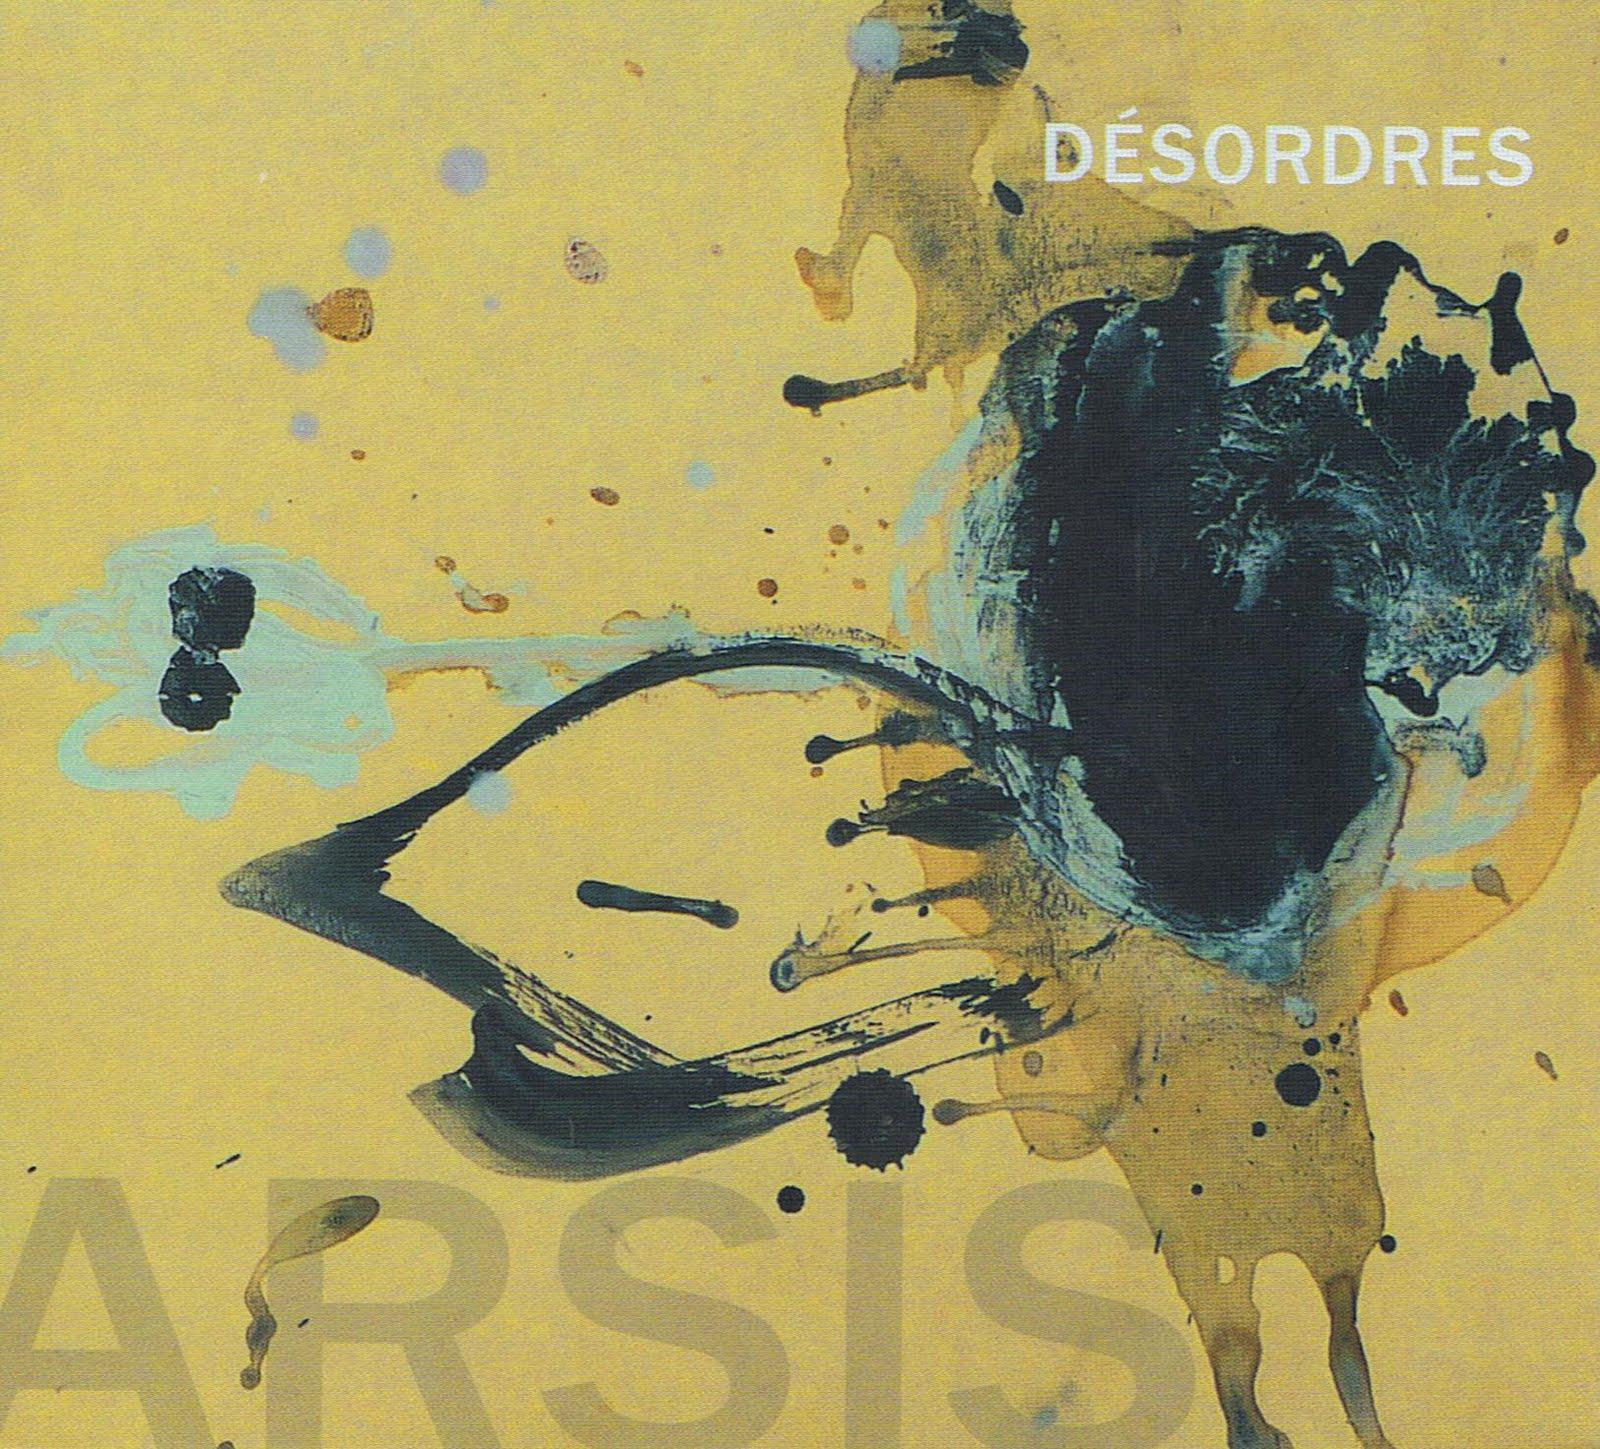 Arsis - Désordres (Circum-Disc, 2010) **** ~ The Free Jazz Collective